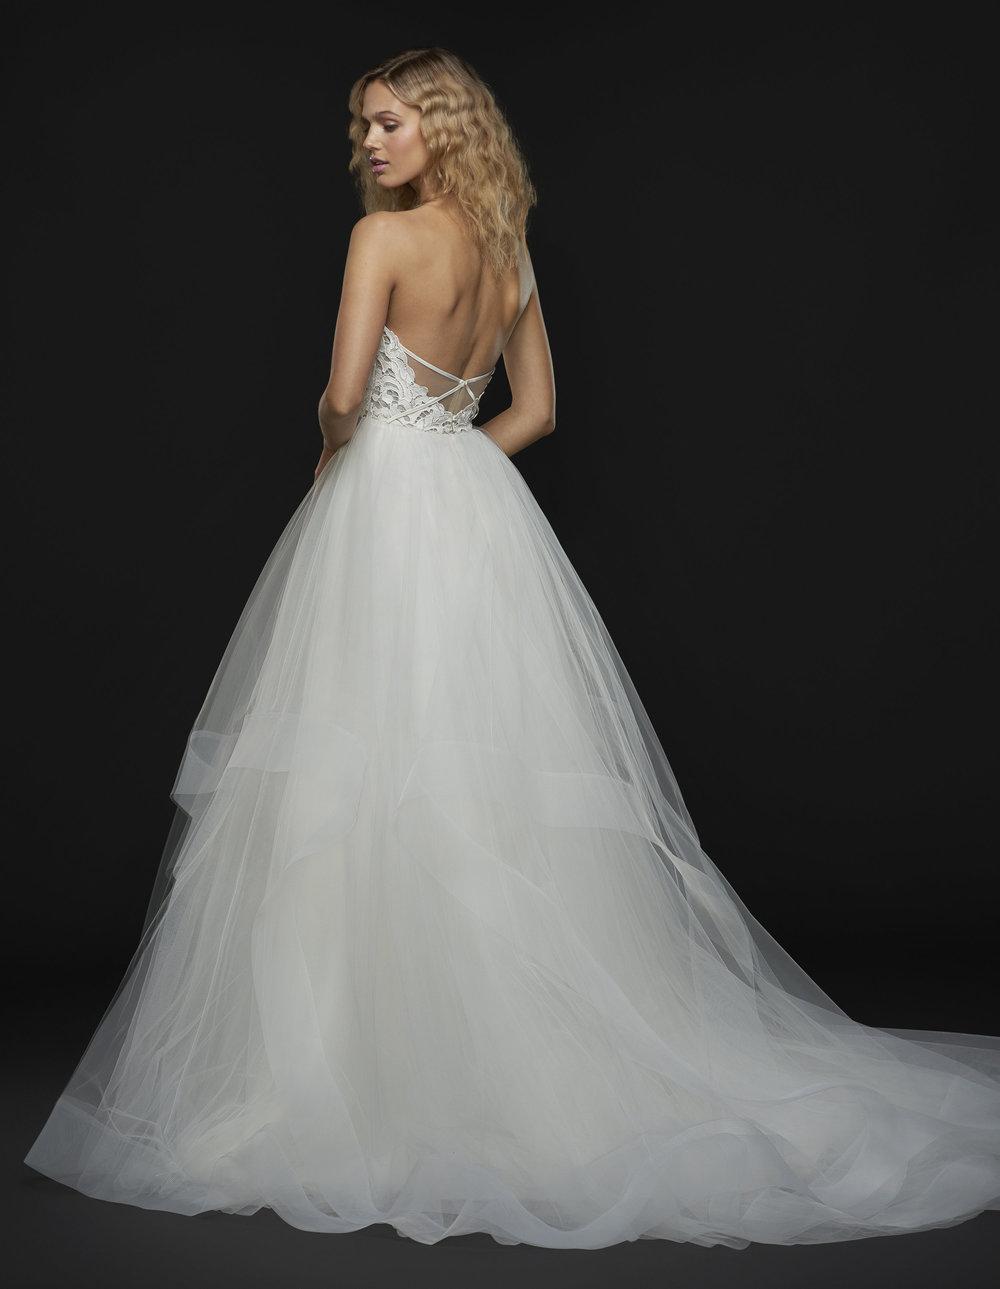 blush-hayley-paige-bridal-fall-2017-style-1760-dayton_ivory-and-beau-savannah-bridal-boutique-savannah-wedding-dresses-savannah-bridal-boutique.jpg